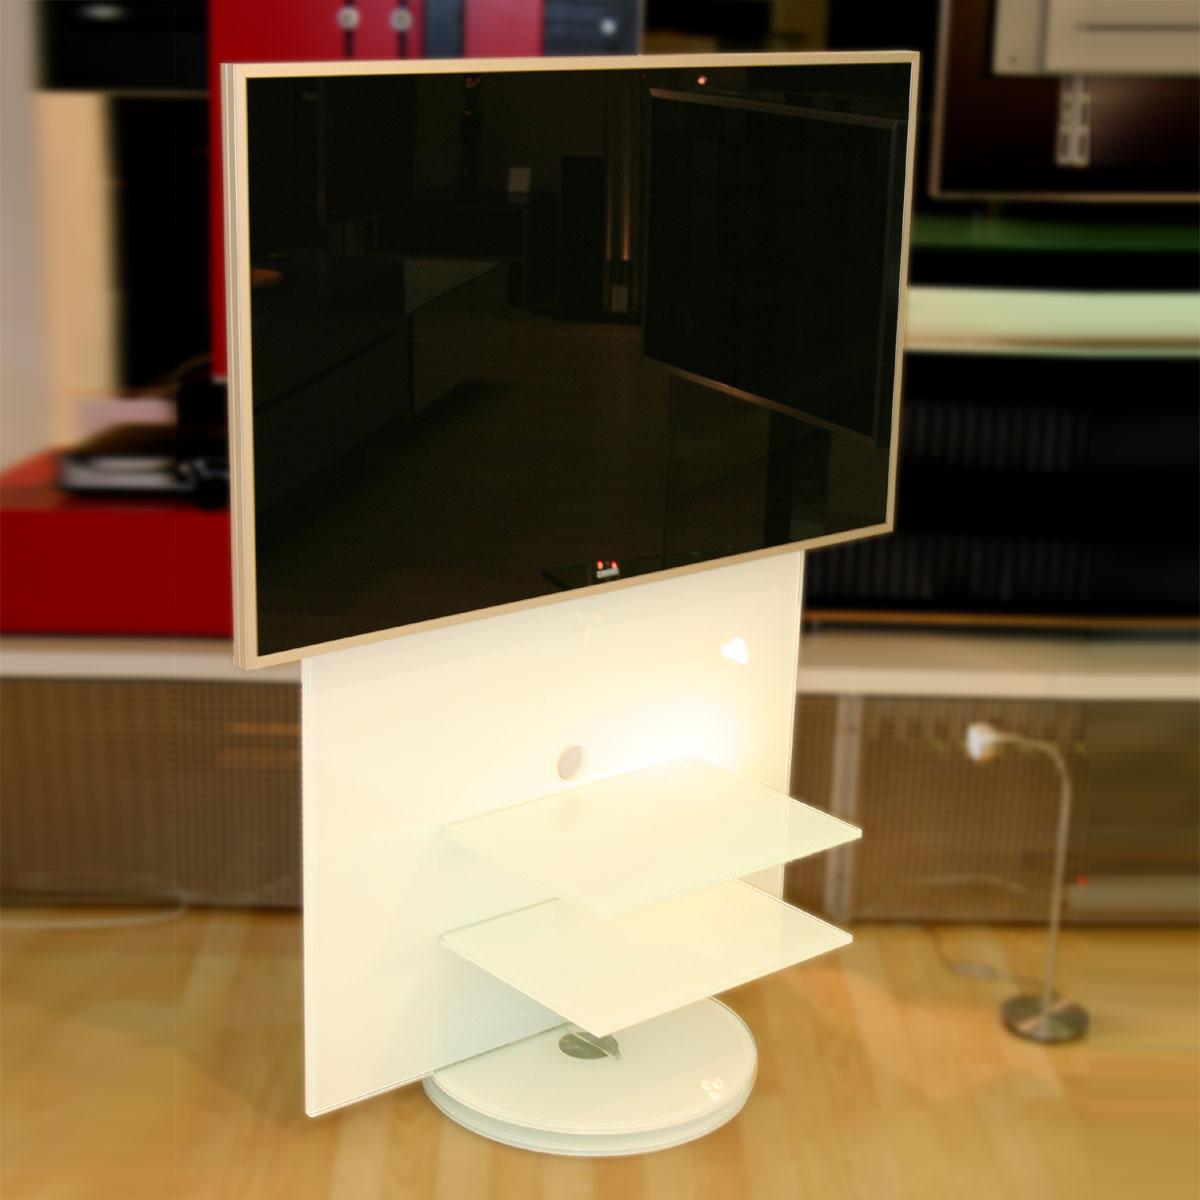 tv schrank drehbar hemnes tvmbel kombination with tv schrank drehbar awesome ricoo fr mit. Black Bedroom Furniture Sets. Home Design Ideas